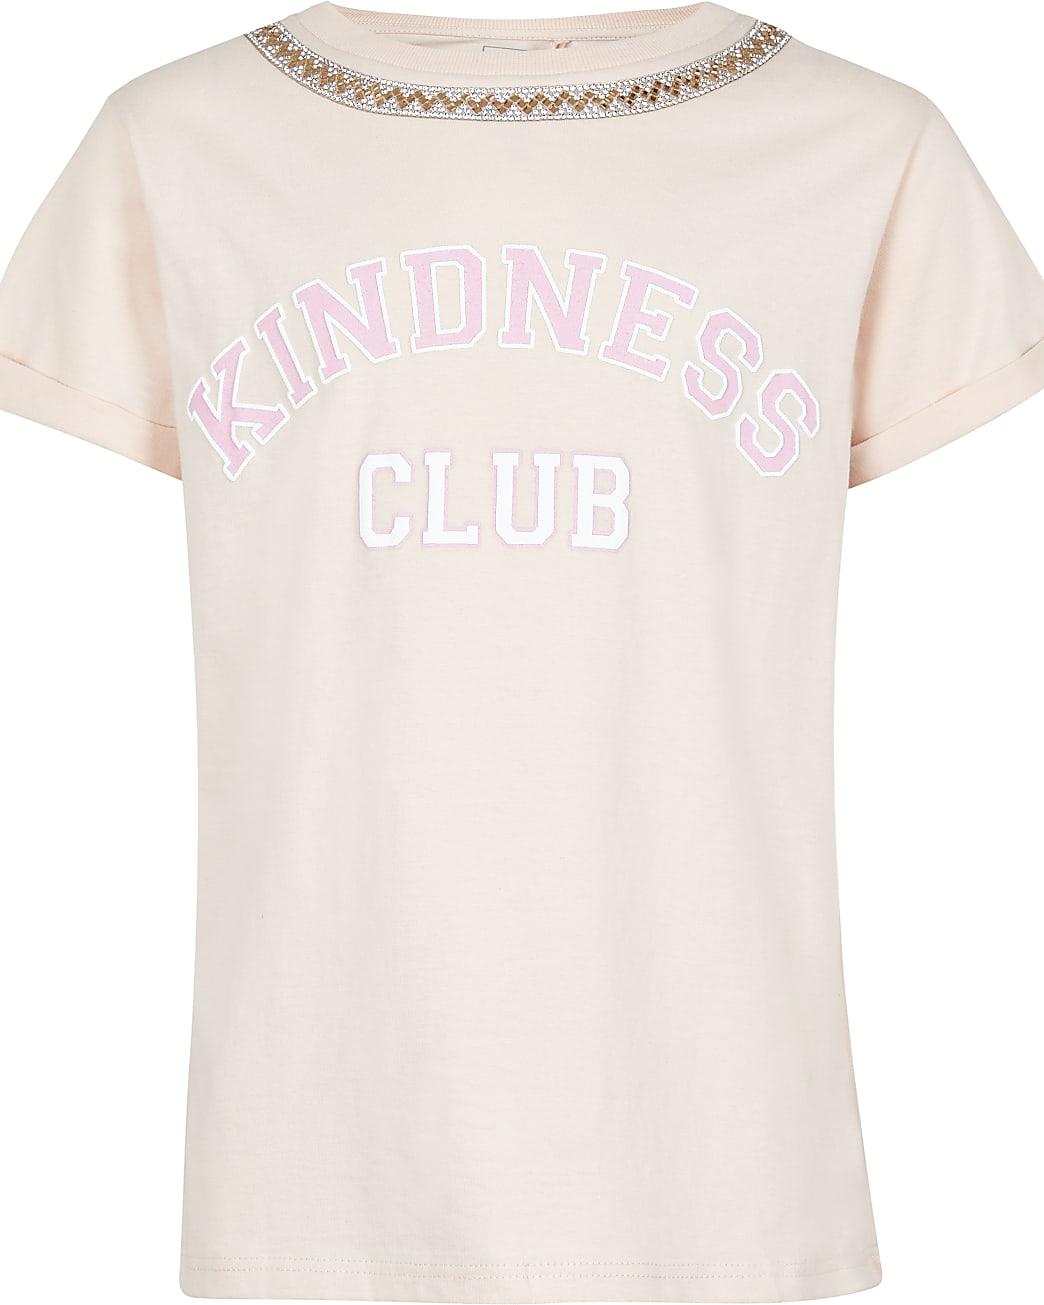 Girls pink 'Kindness Club' printed t-shirt